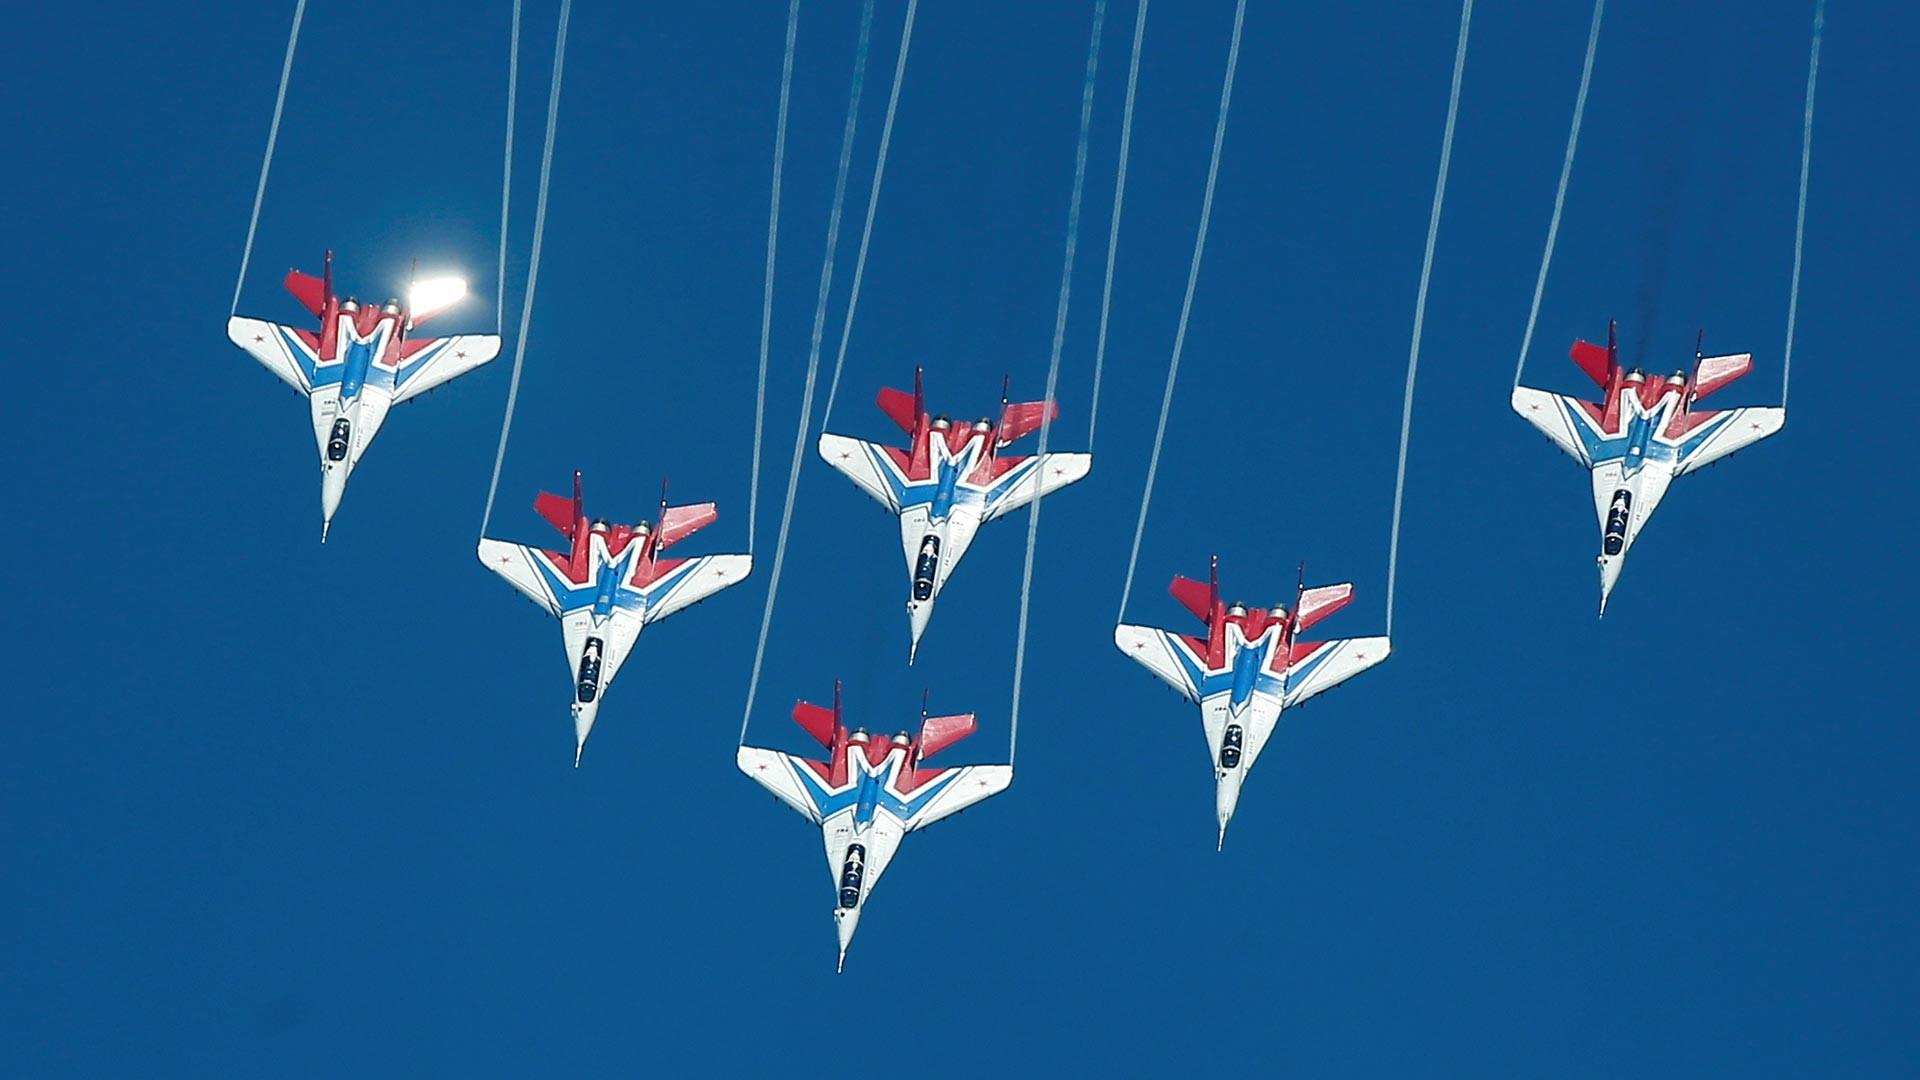 Le groupe de voltige aérienne Striji